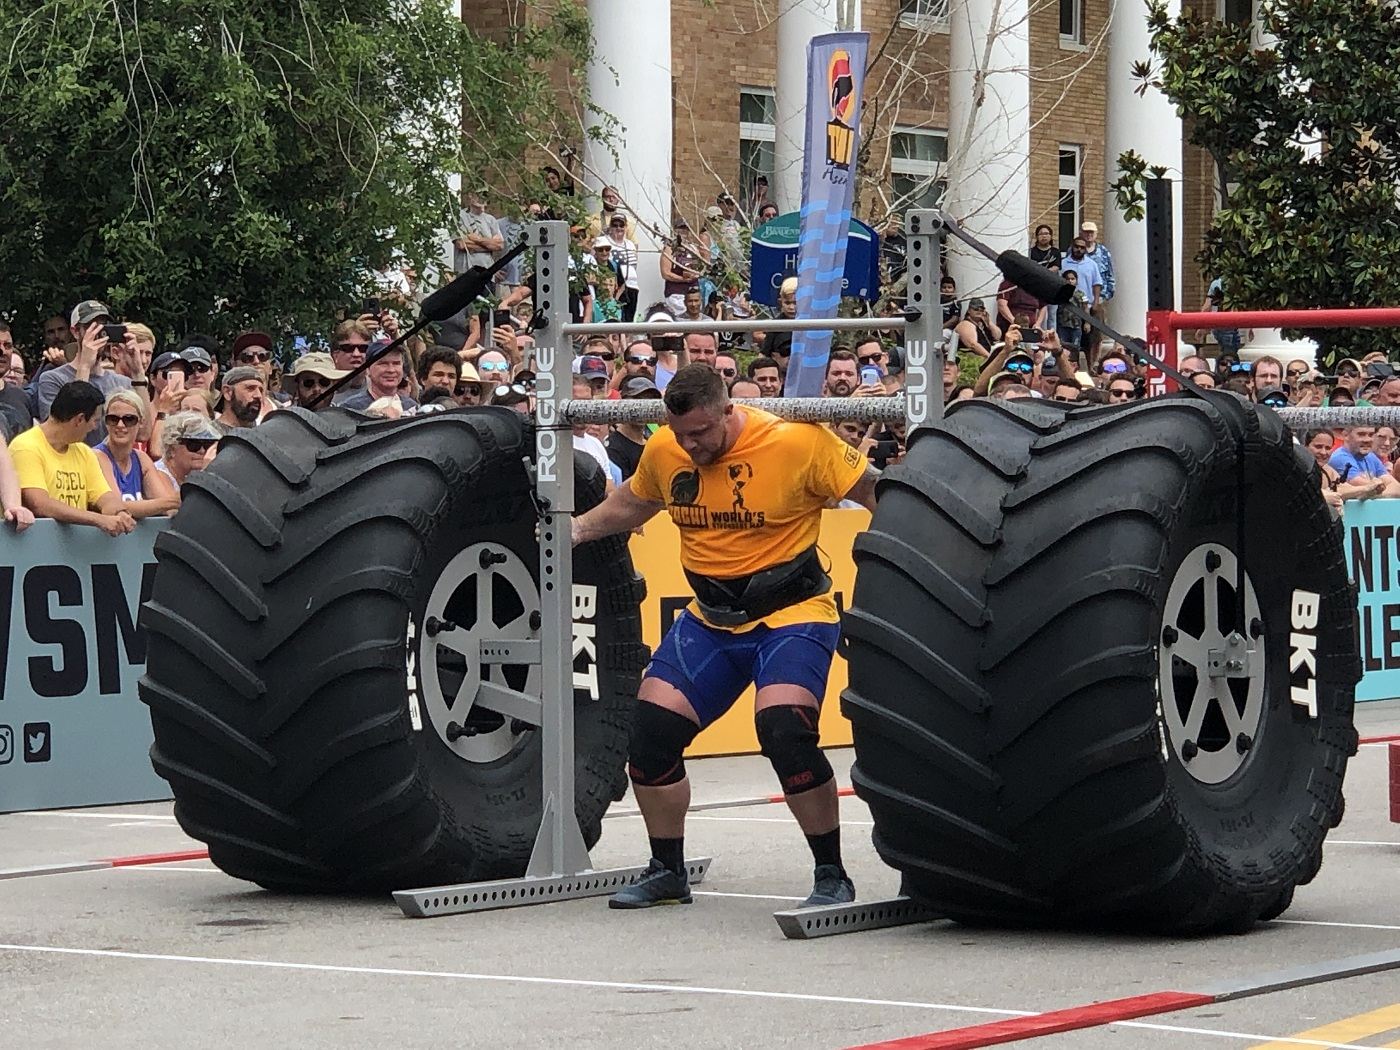 Tire Lift